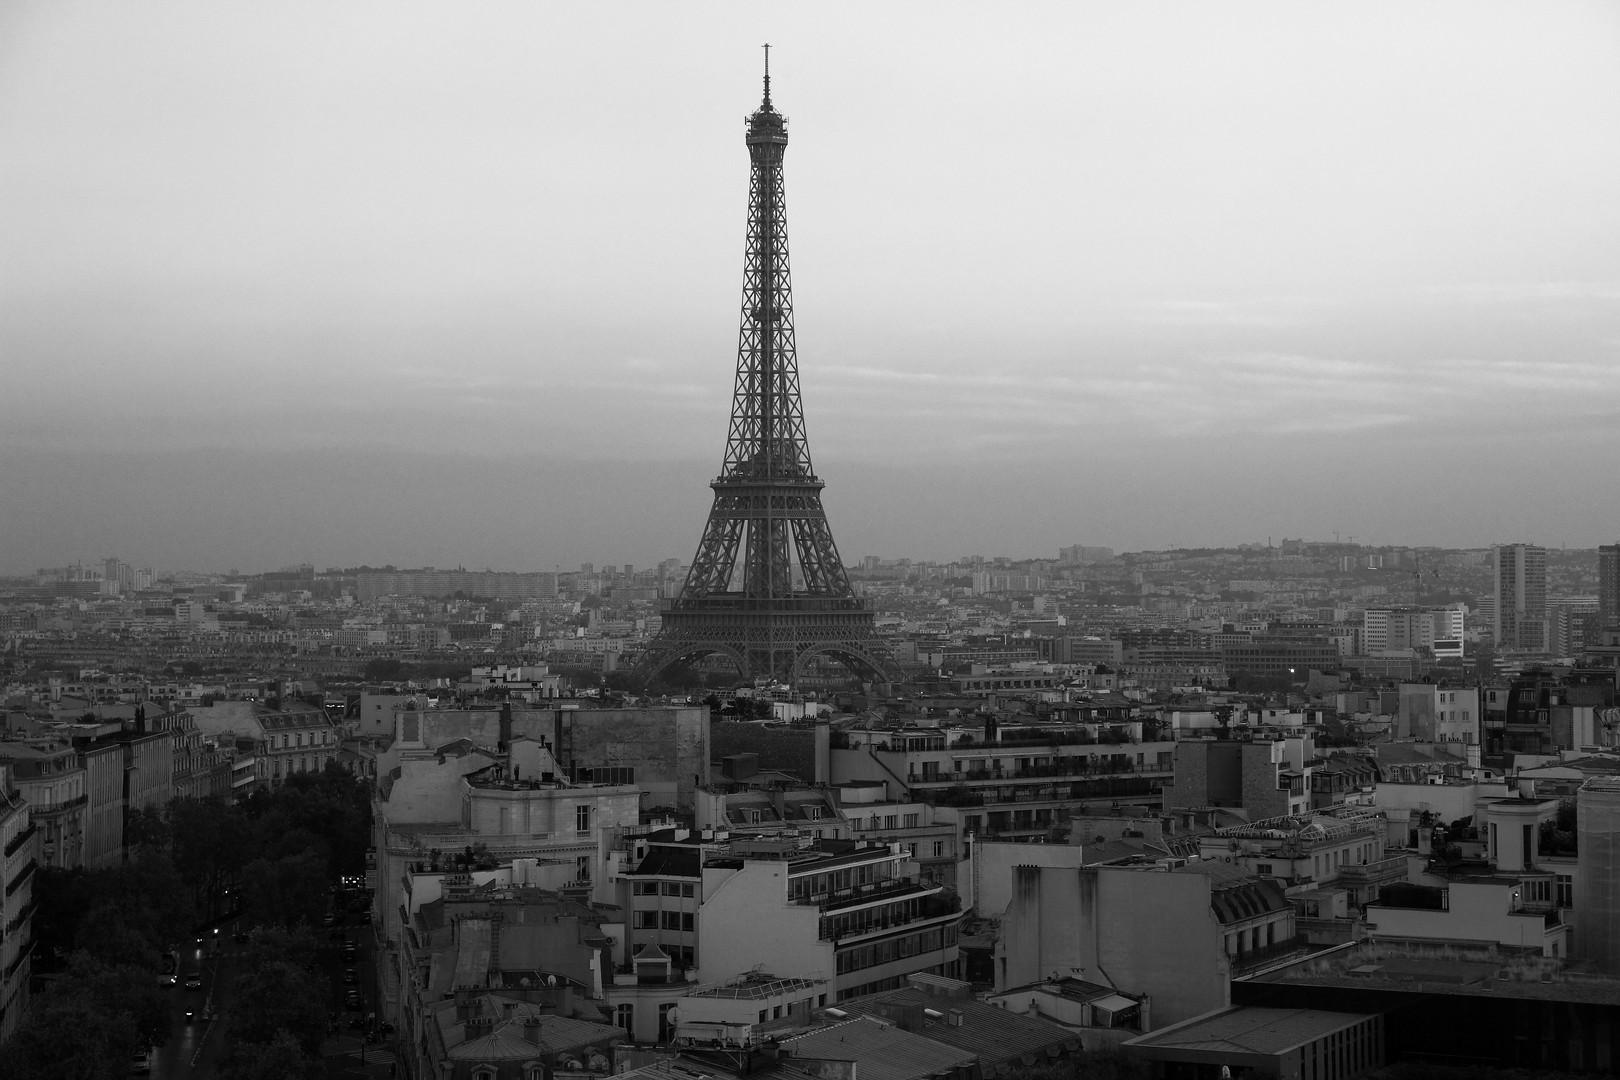 Paris Eiffel Tower B&W 2016.JPG